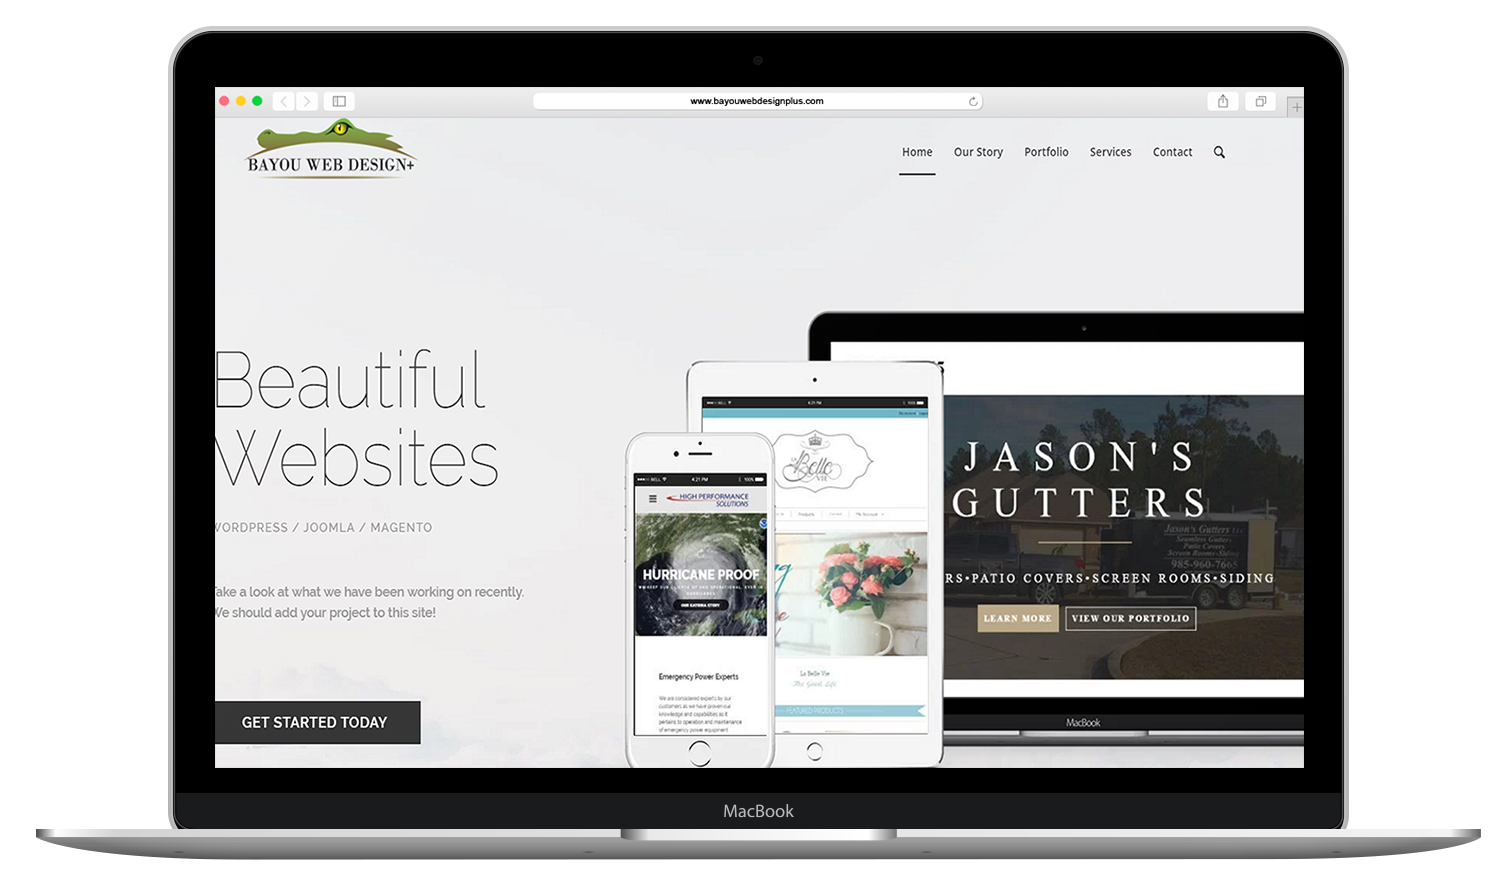 Bayou Web Design